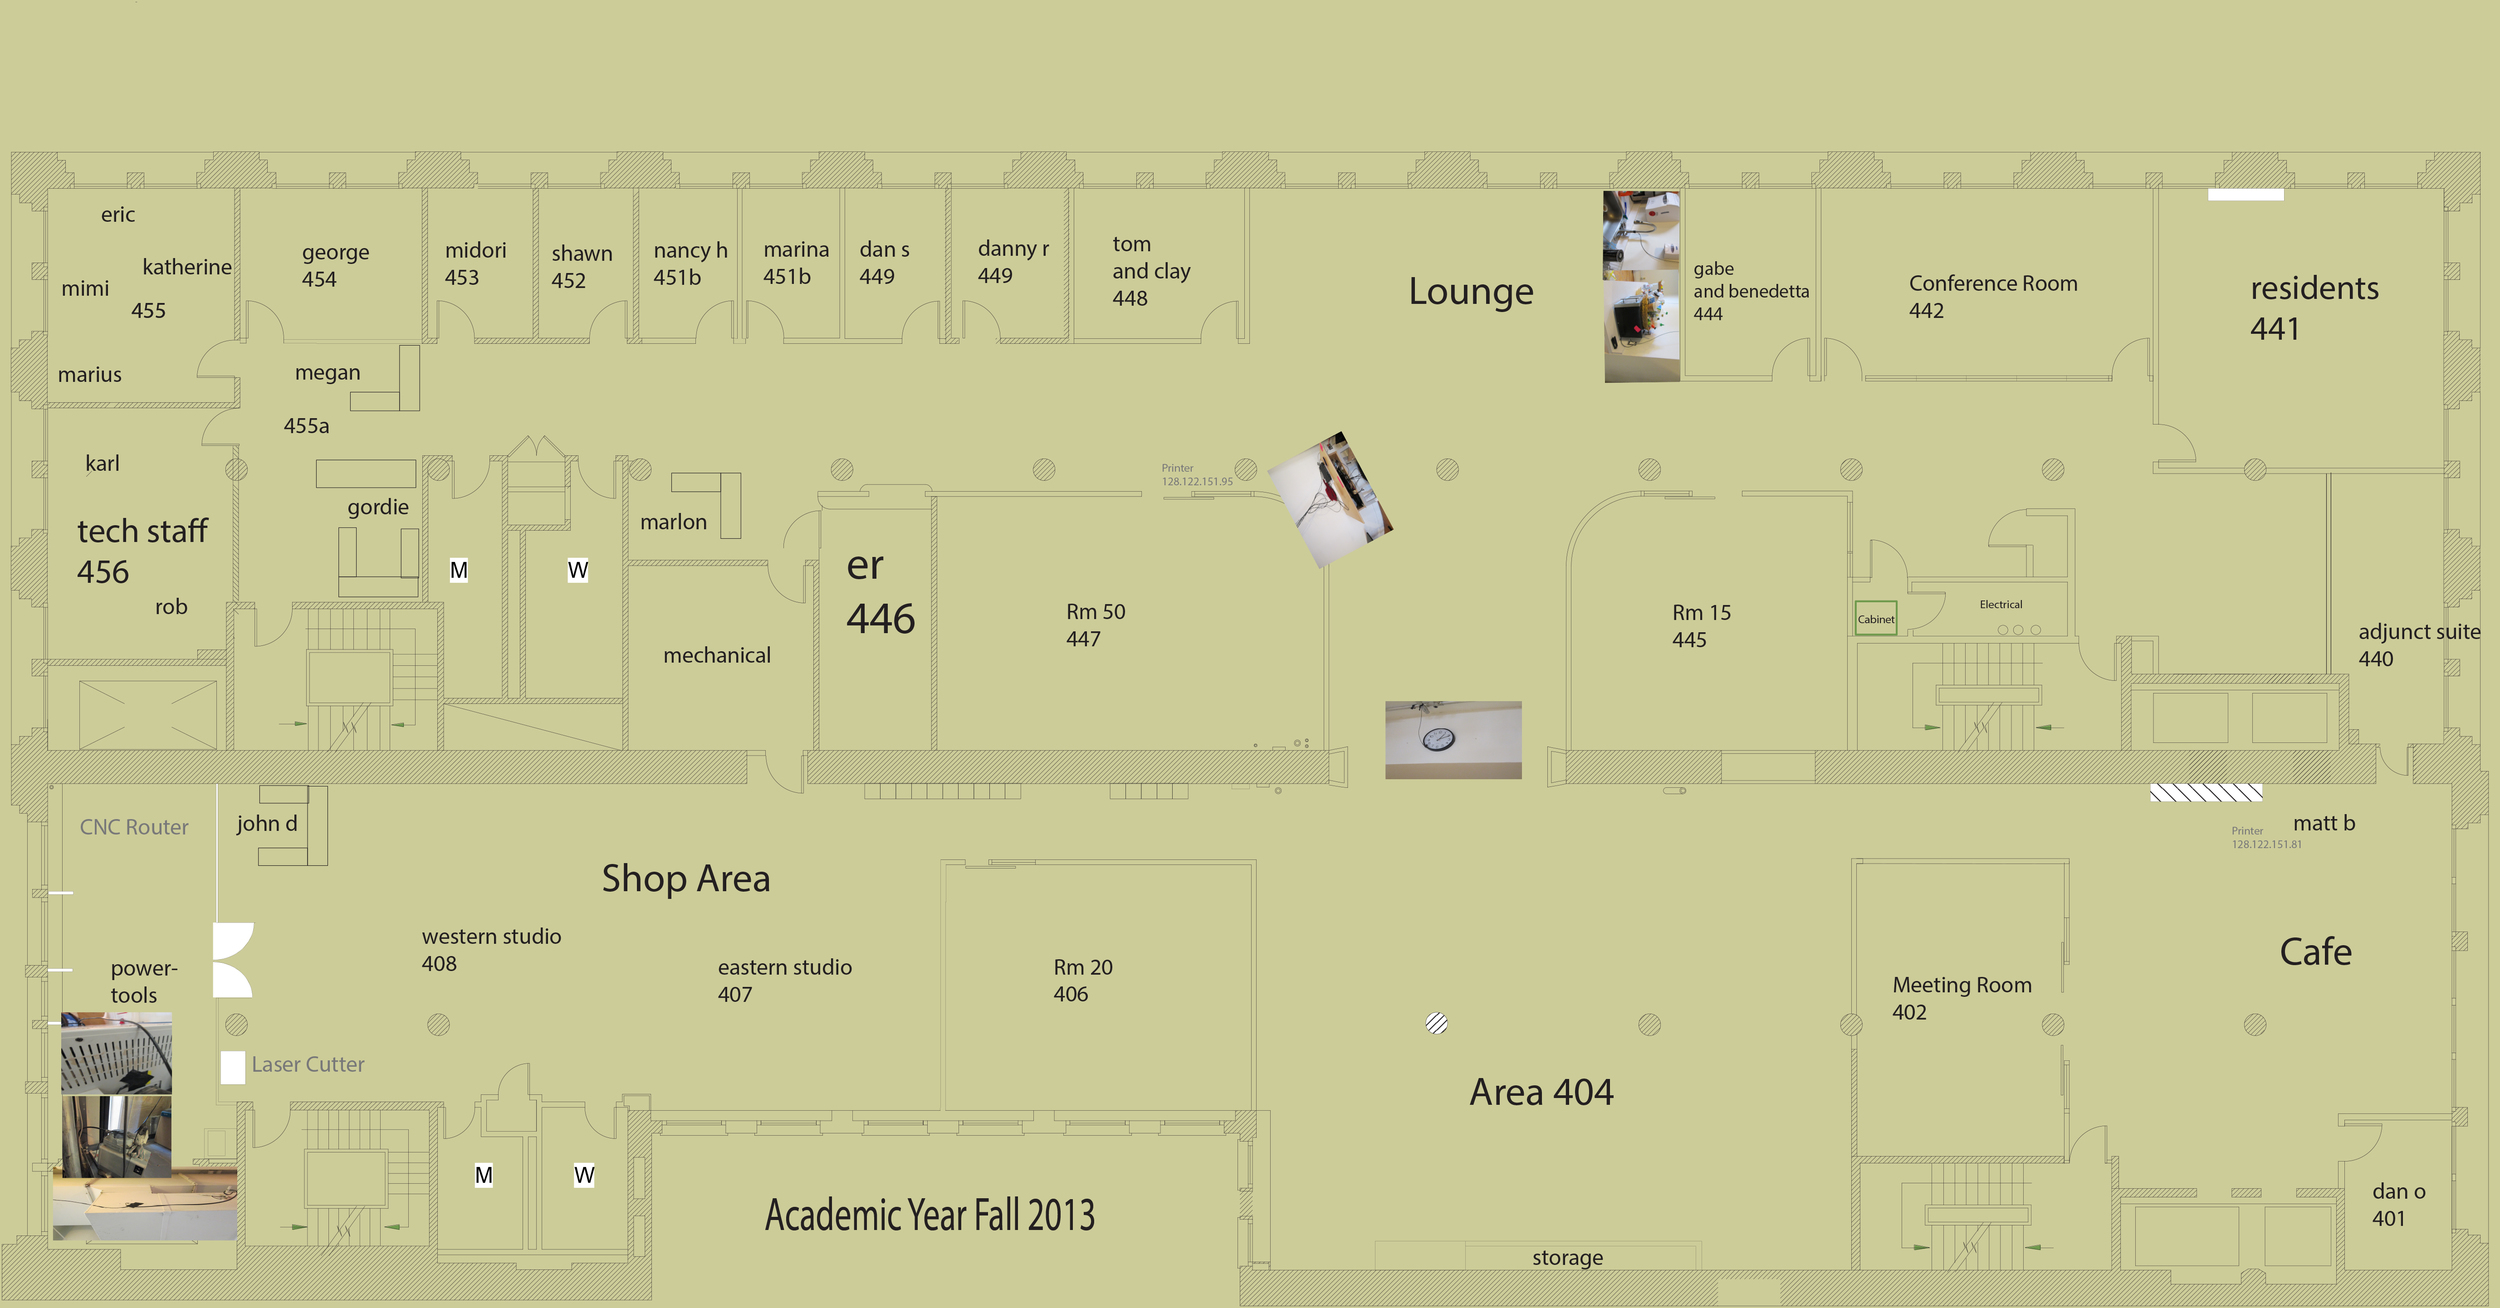 floormap_ITP_micmap.jpg